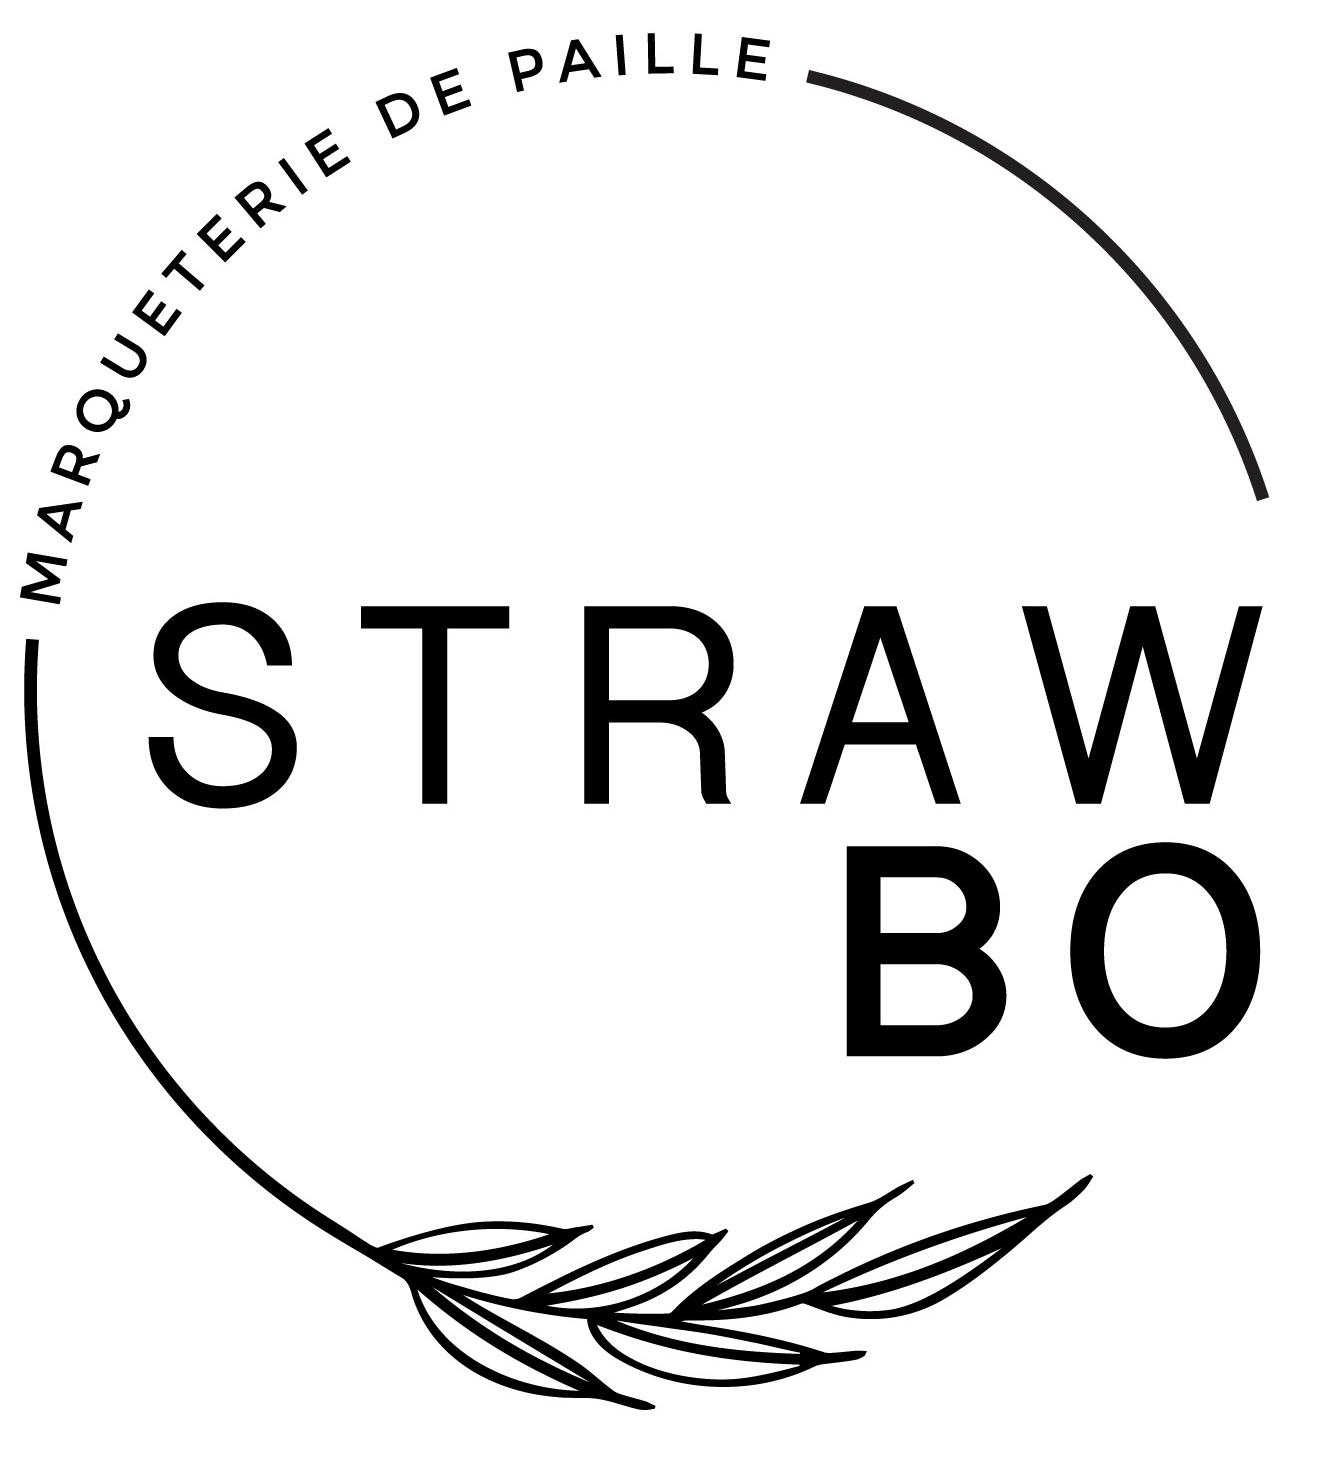 Straw Bo